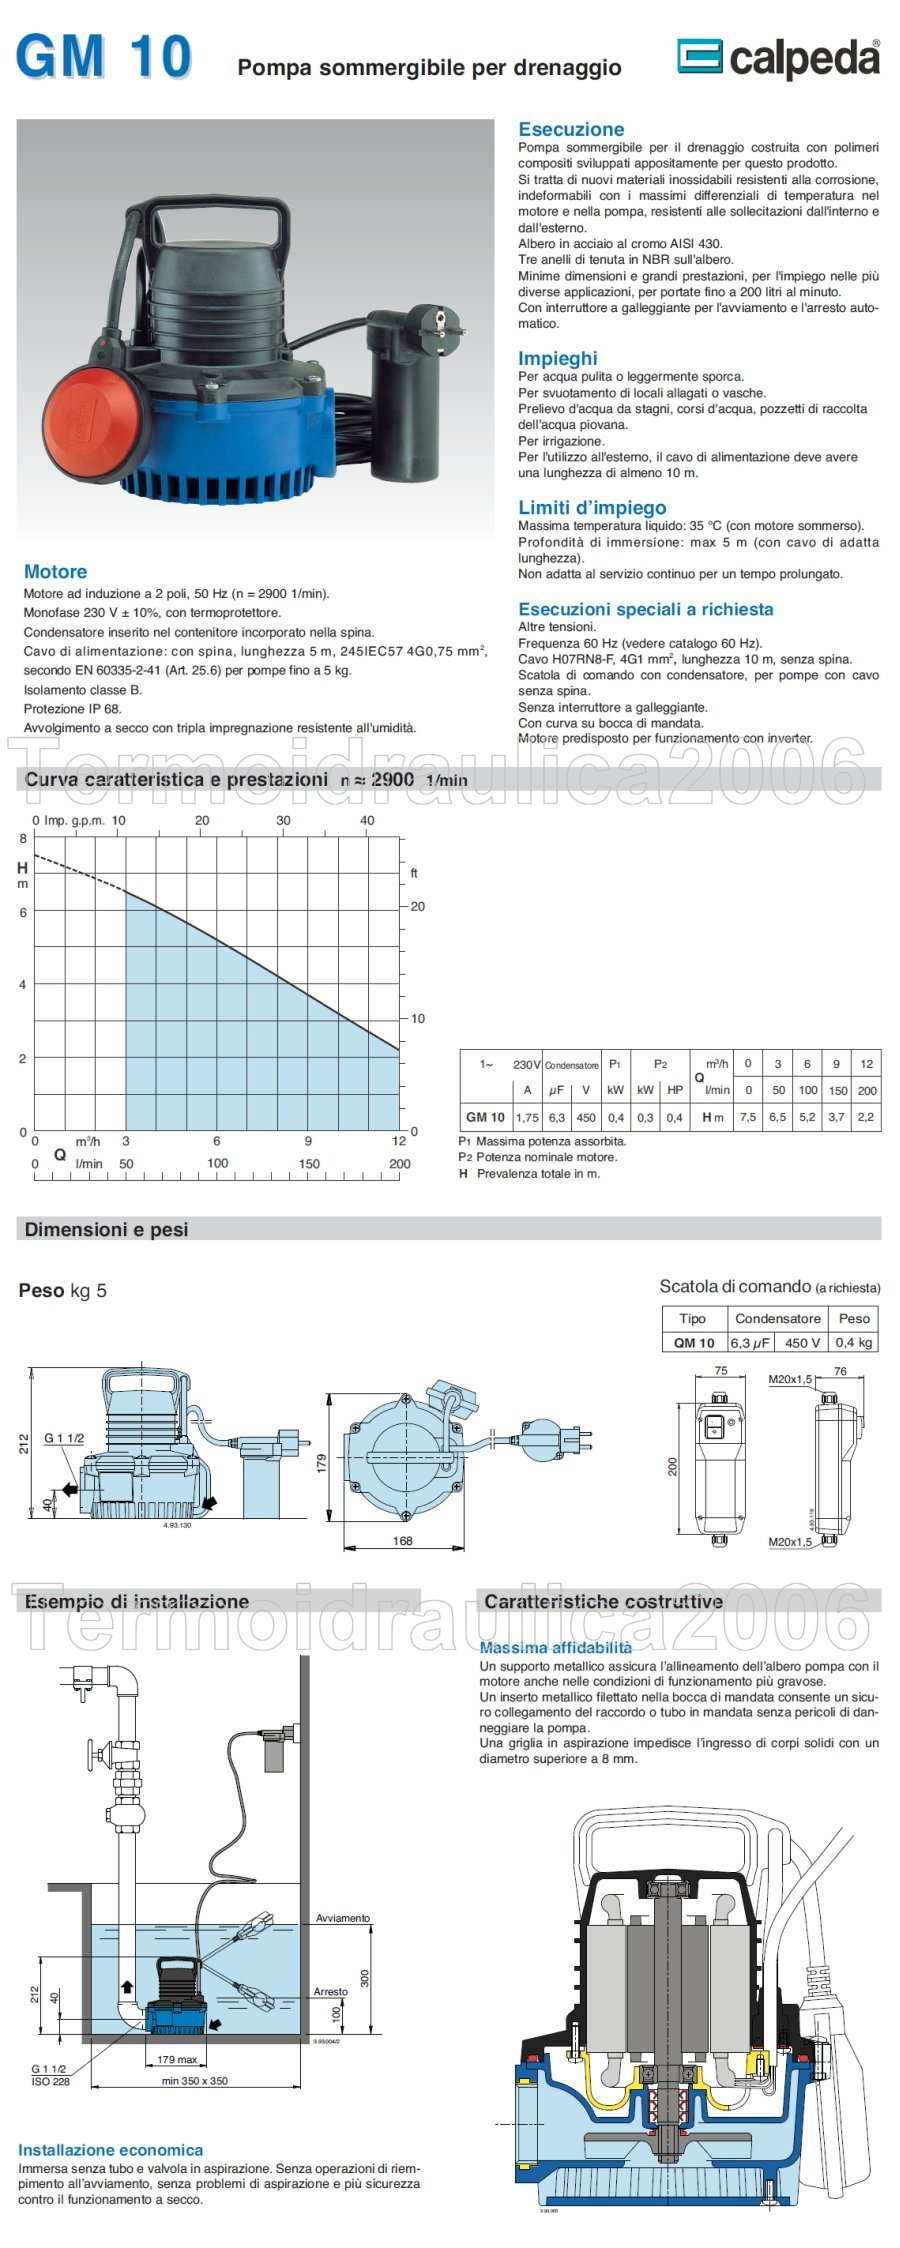 Scheda tecnica Calpeda GM10